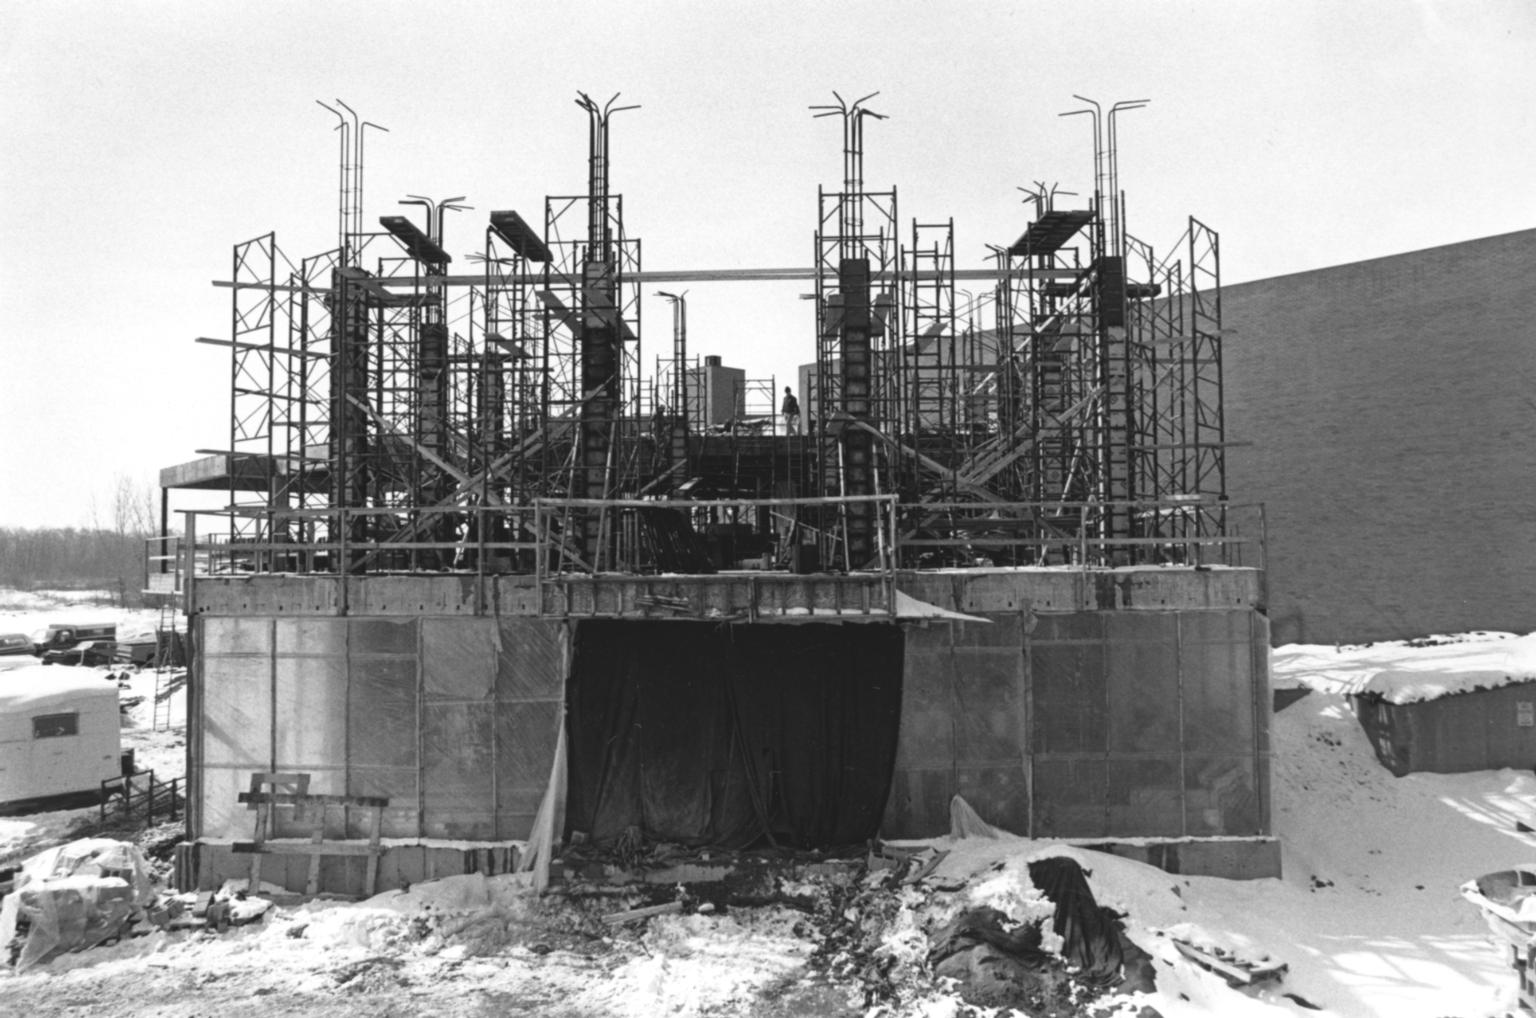 Ground View of the Construction of the Kilian J. and Caroline F. Schmitt Interfaith Center